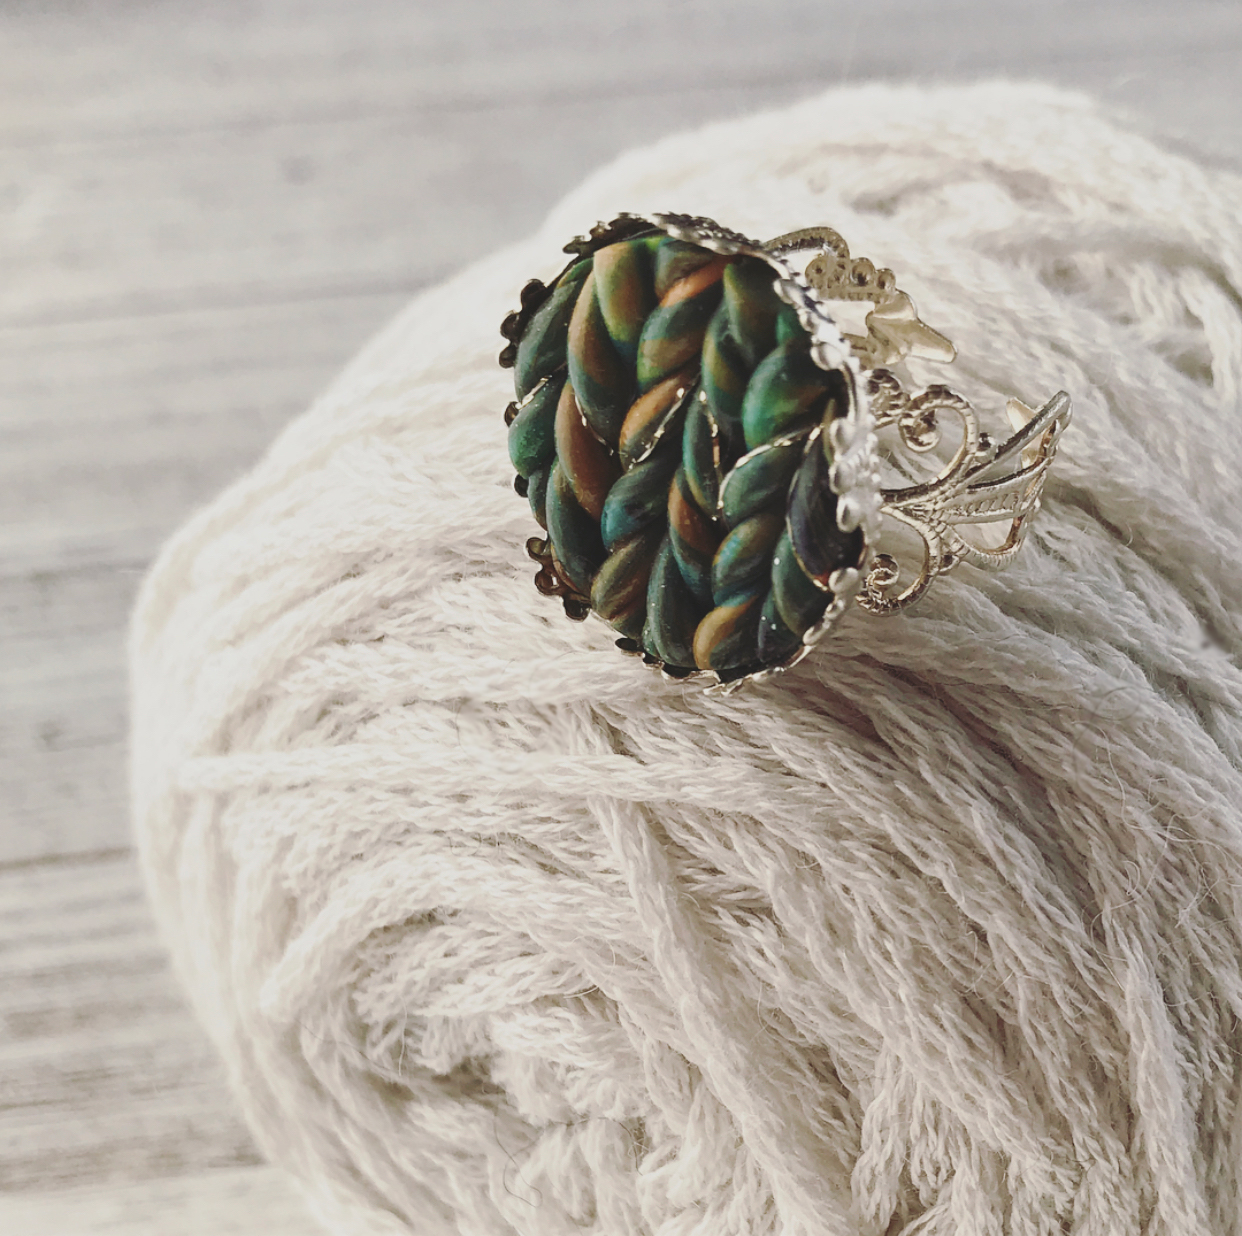 New Handspun Knit Stitch Jewelry